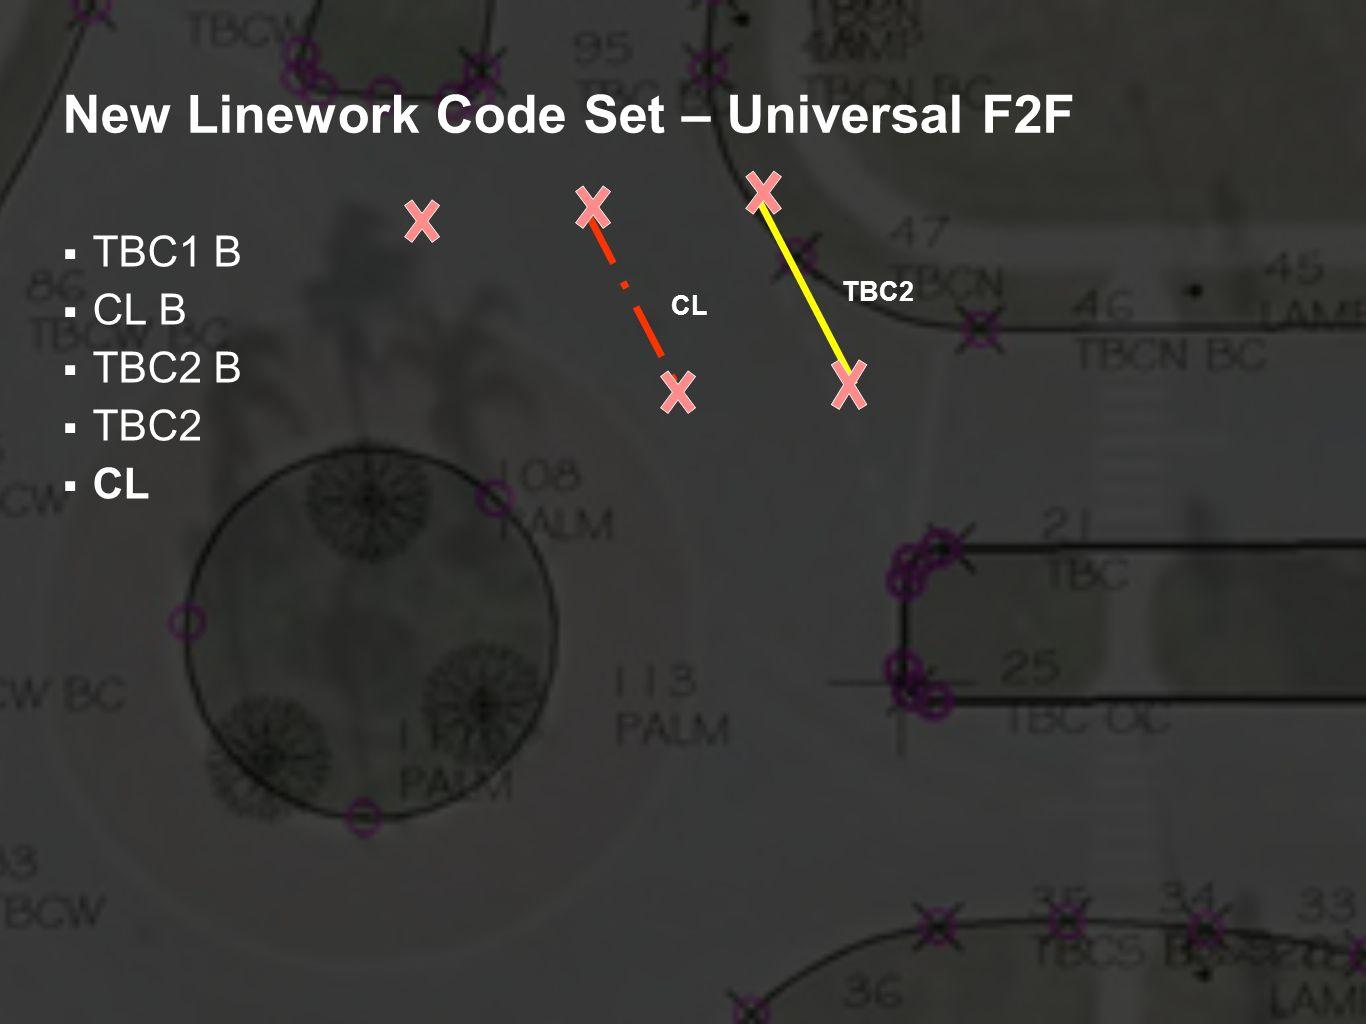 New Linework Code Set – Universal F2F TBC1 B CL B TBC2 B TBC2 CL TBC2 CL